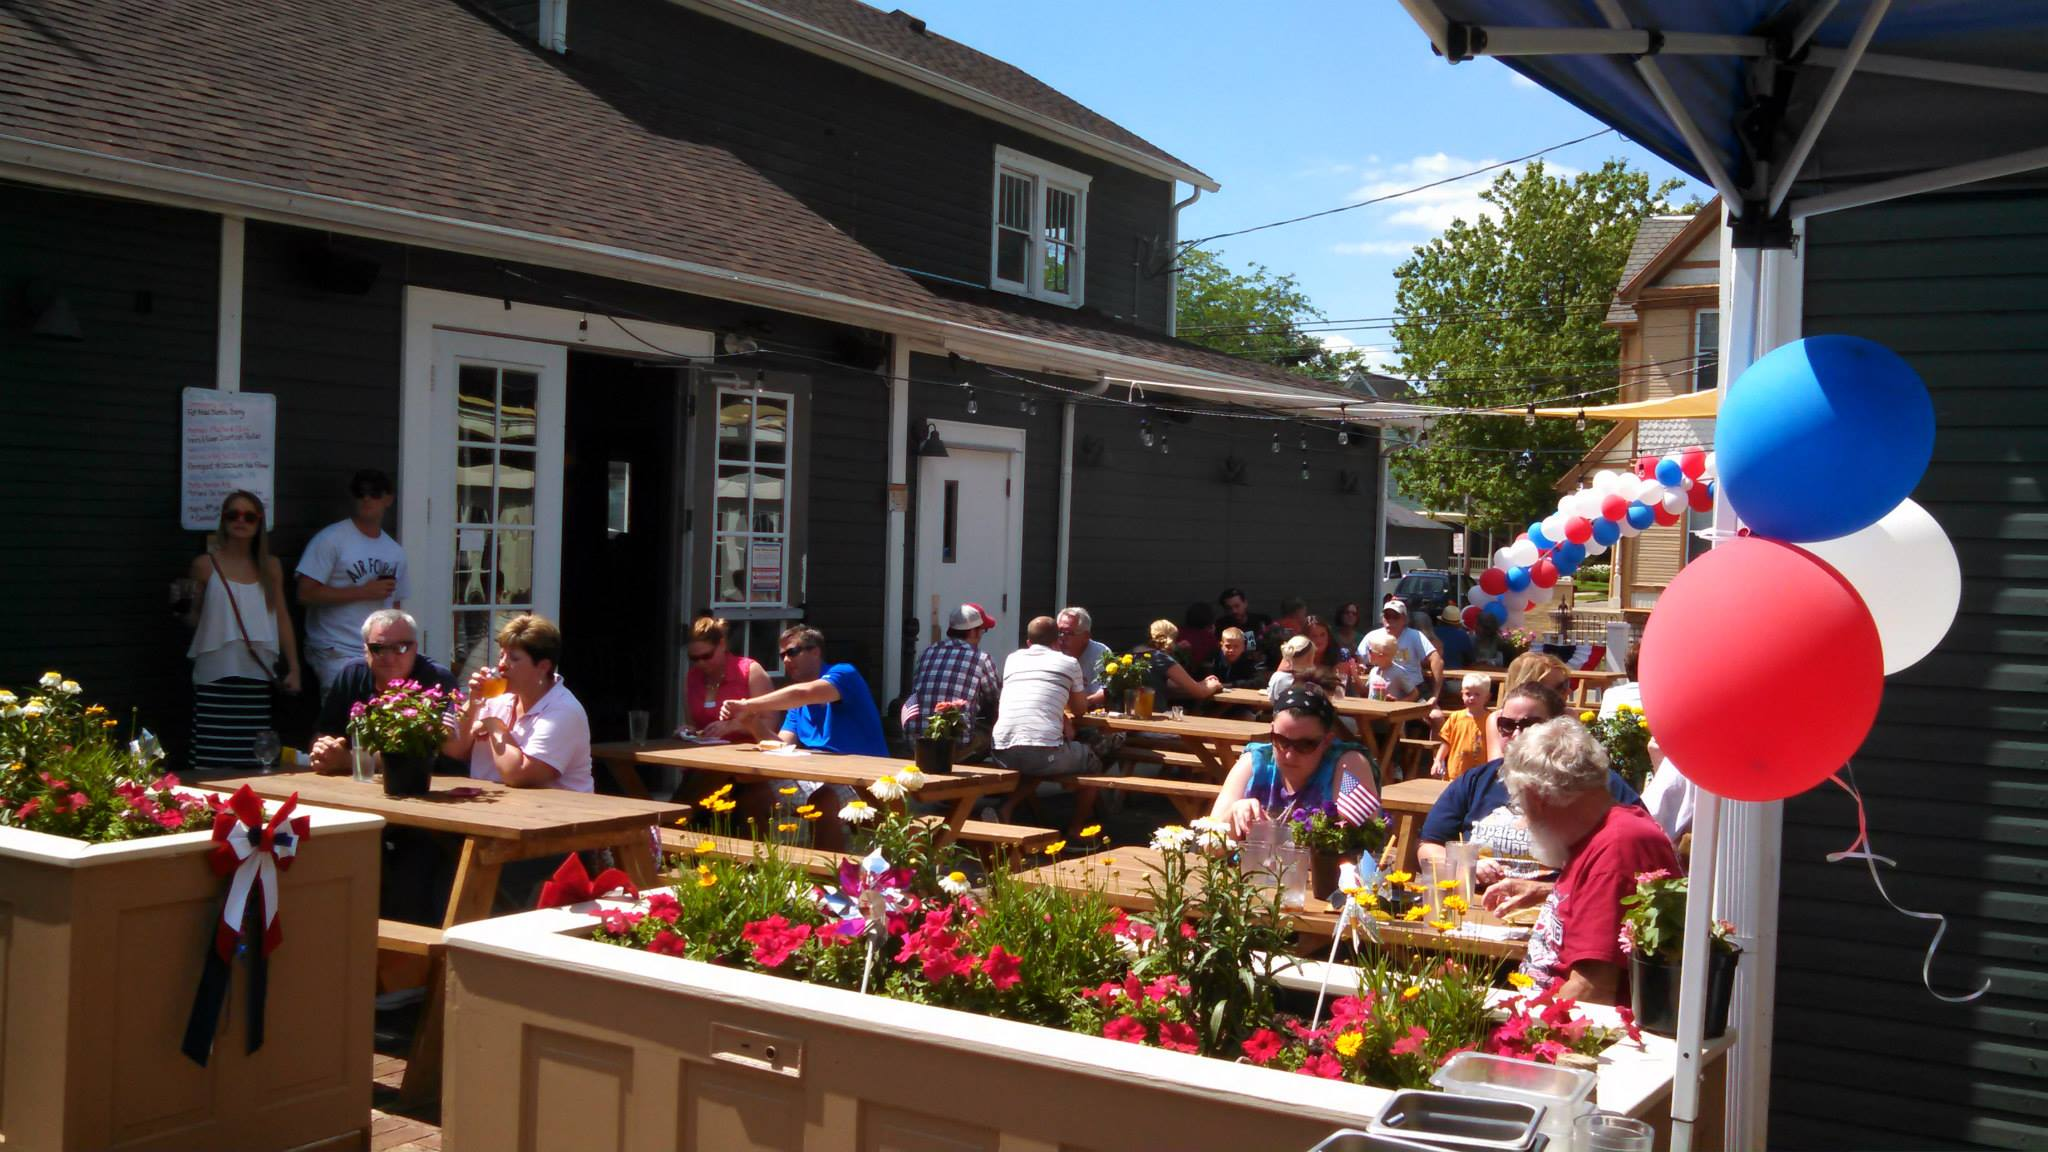 bar patios in dayton outdoor dining